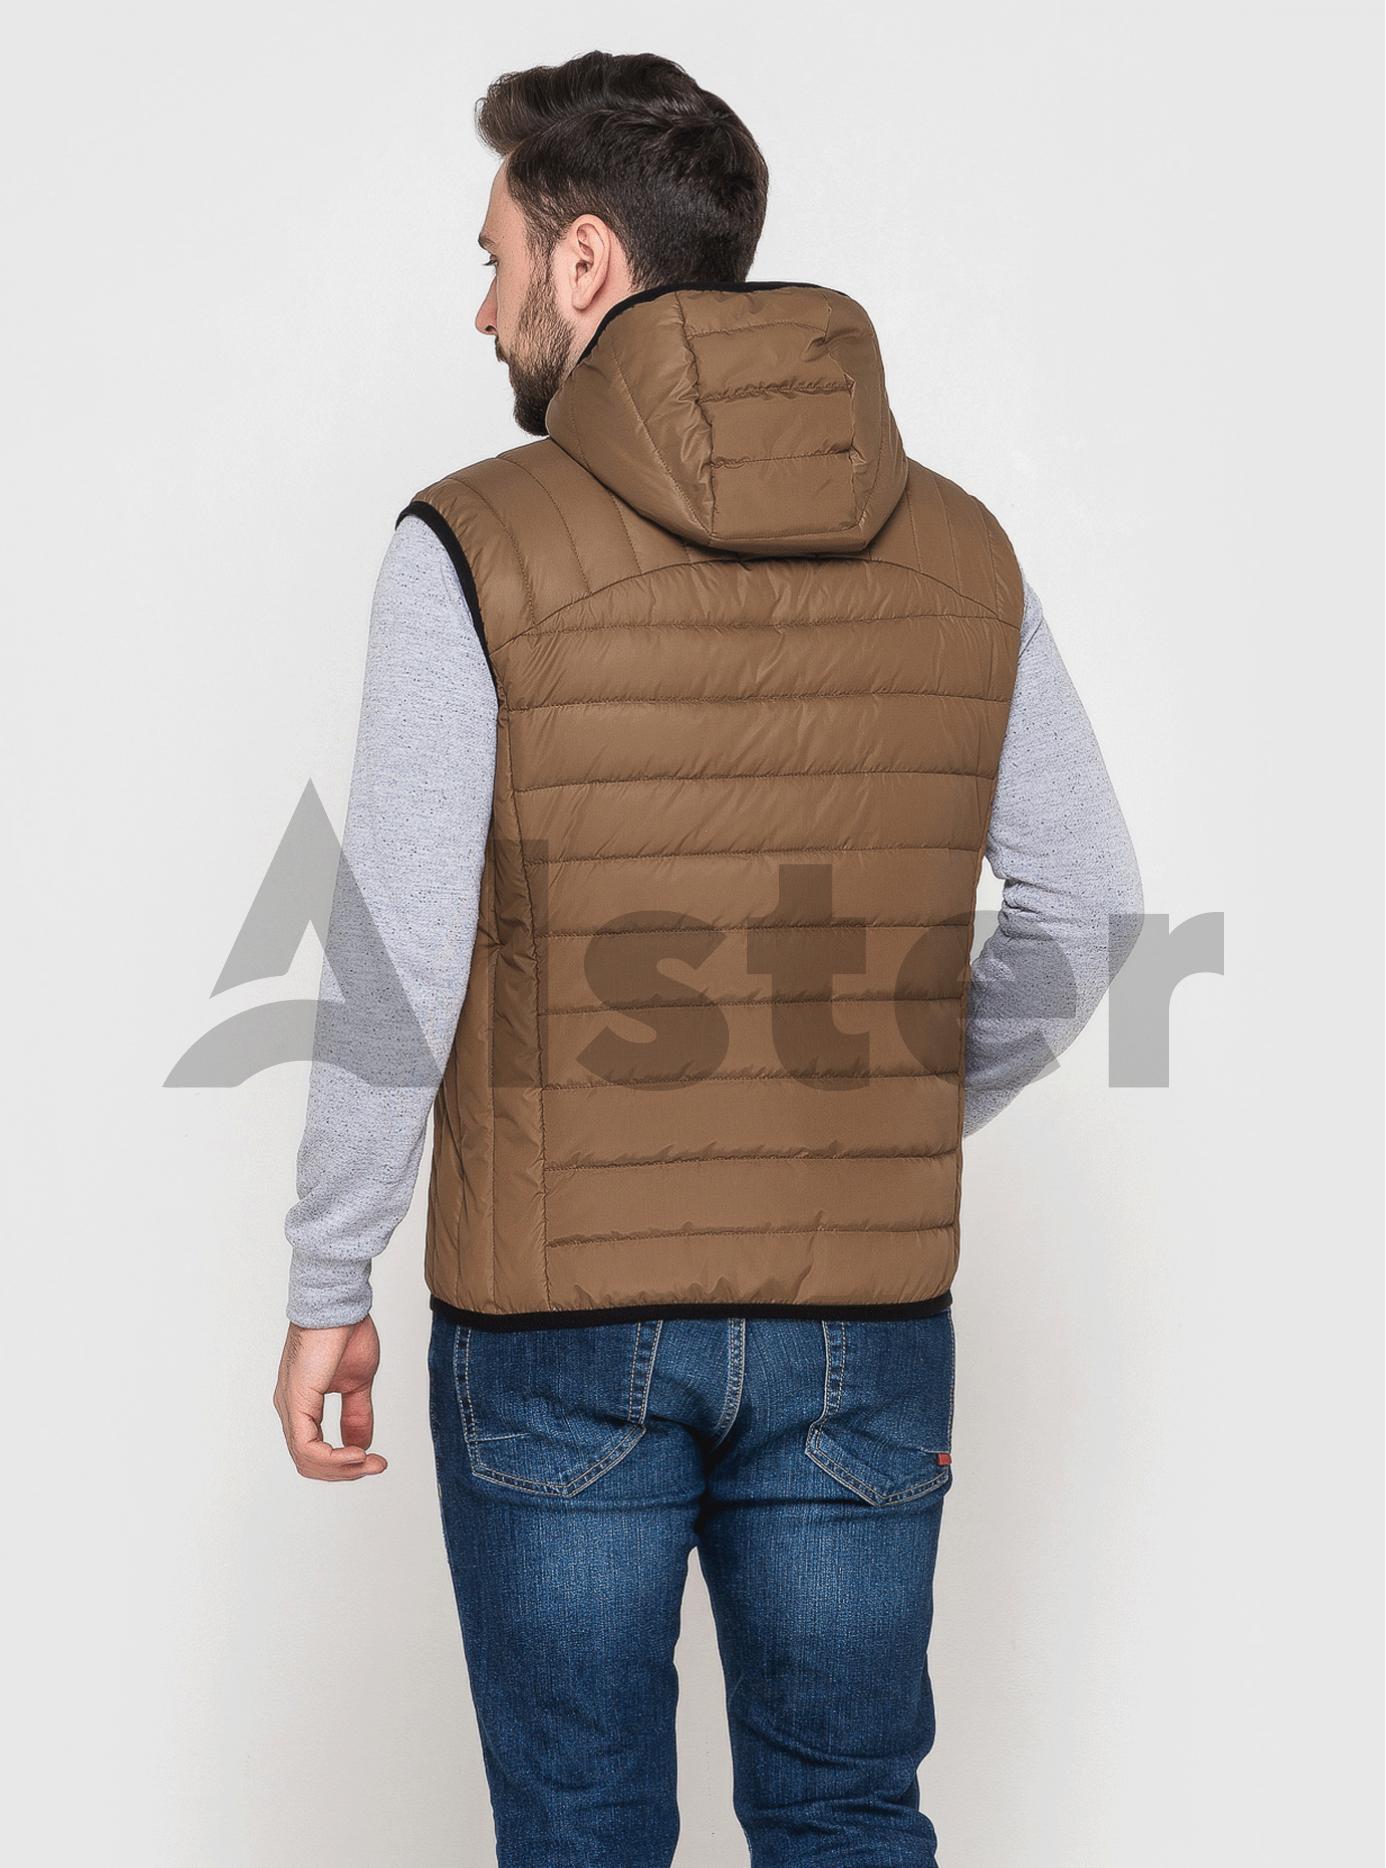 Жилет чоловічий стьобаний з капюшоном Світло-коричневий 46 (02-MT21212): фото - Alster.ua